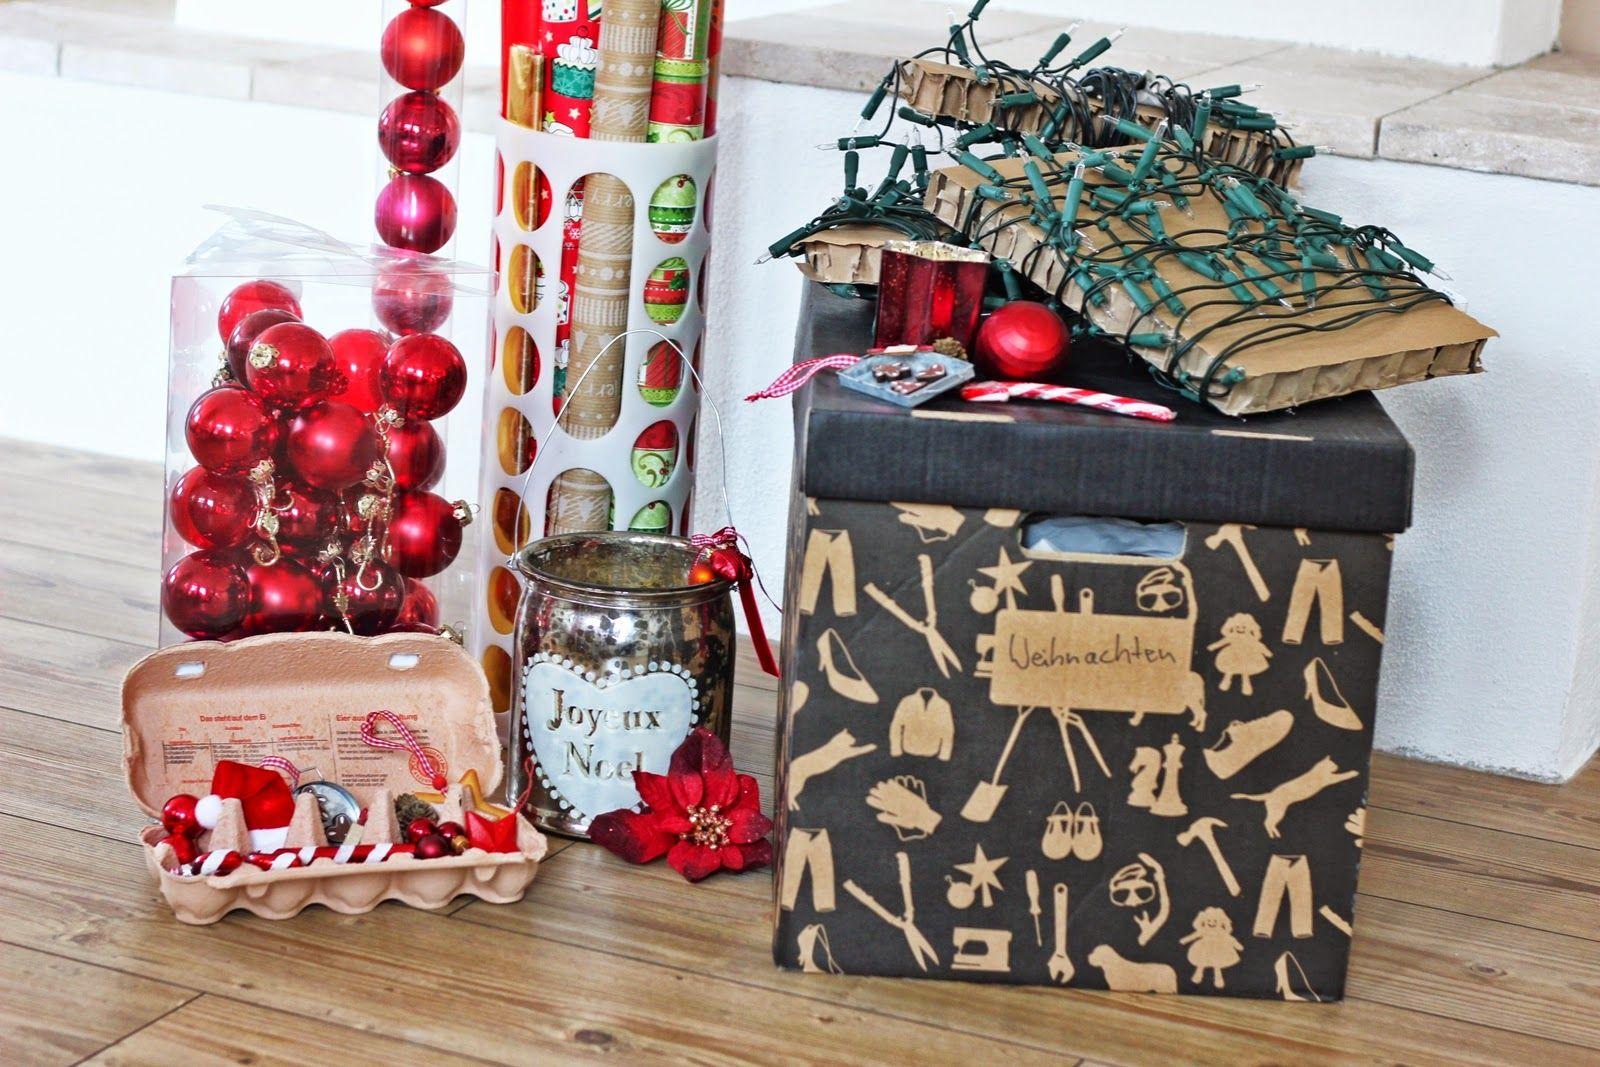 Aufbewahrung Weihnachtskugeln.Pin By Lashelle Parrish On Christmas Holiday Organizing